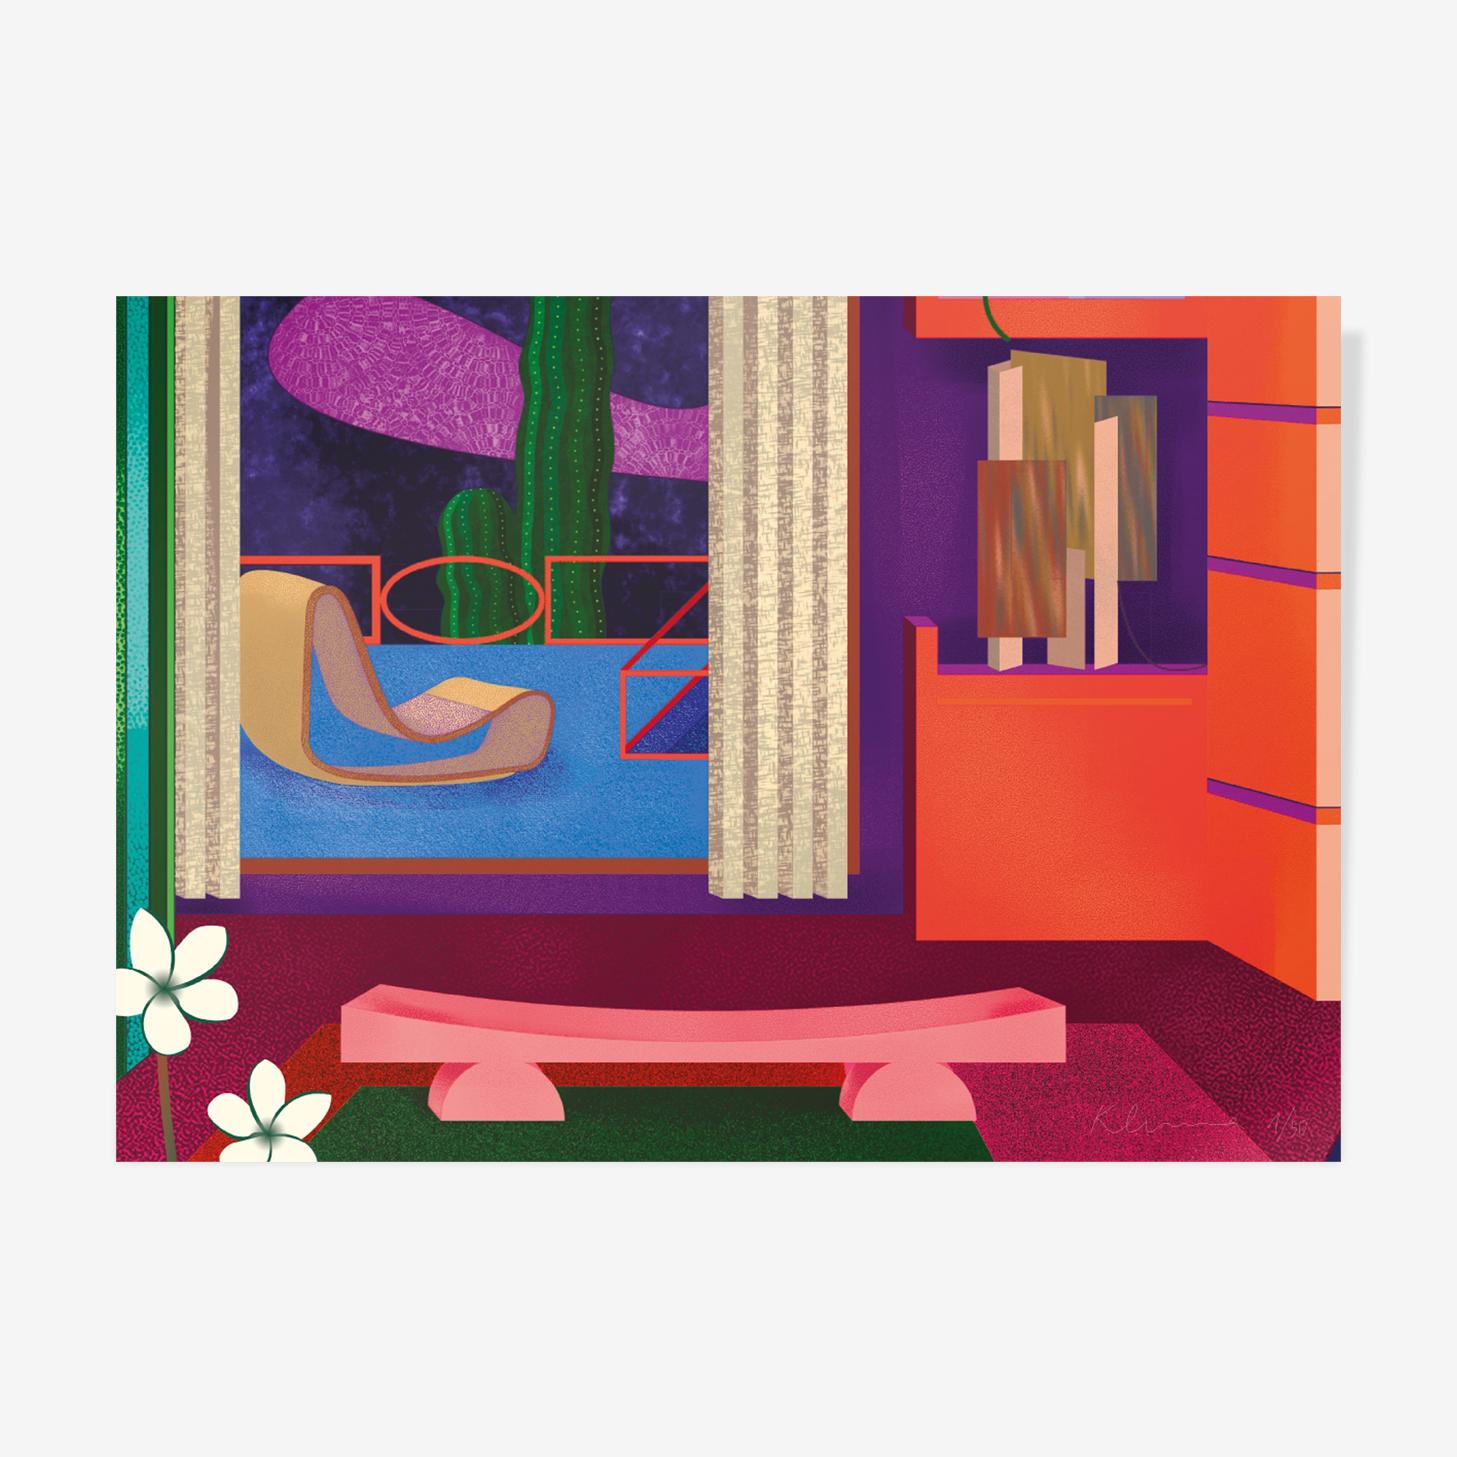 Pamela's bathroom I — A3